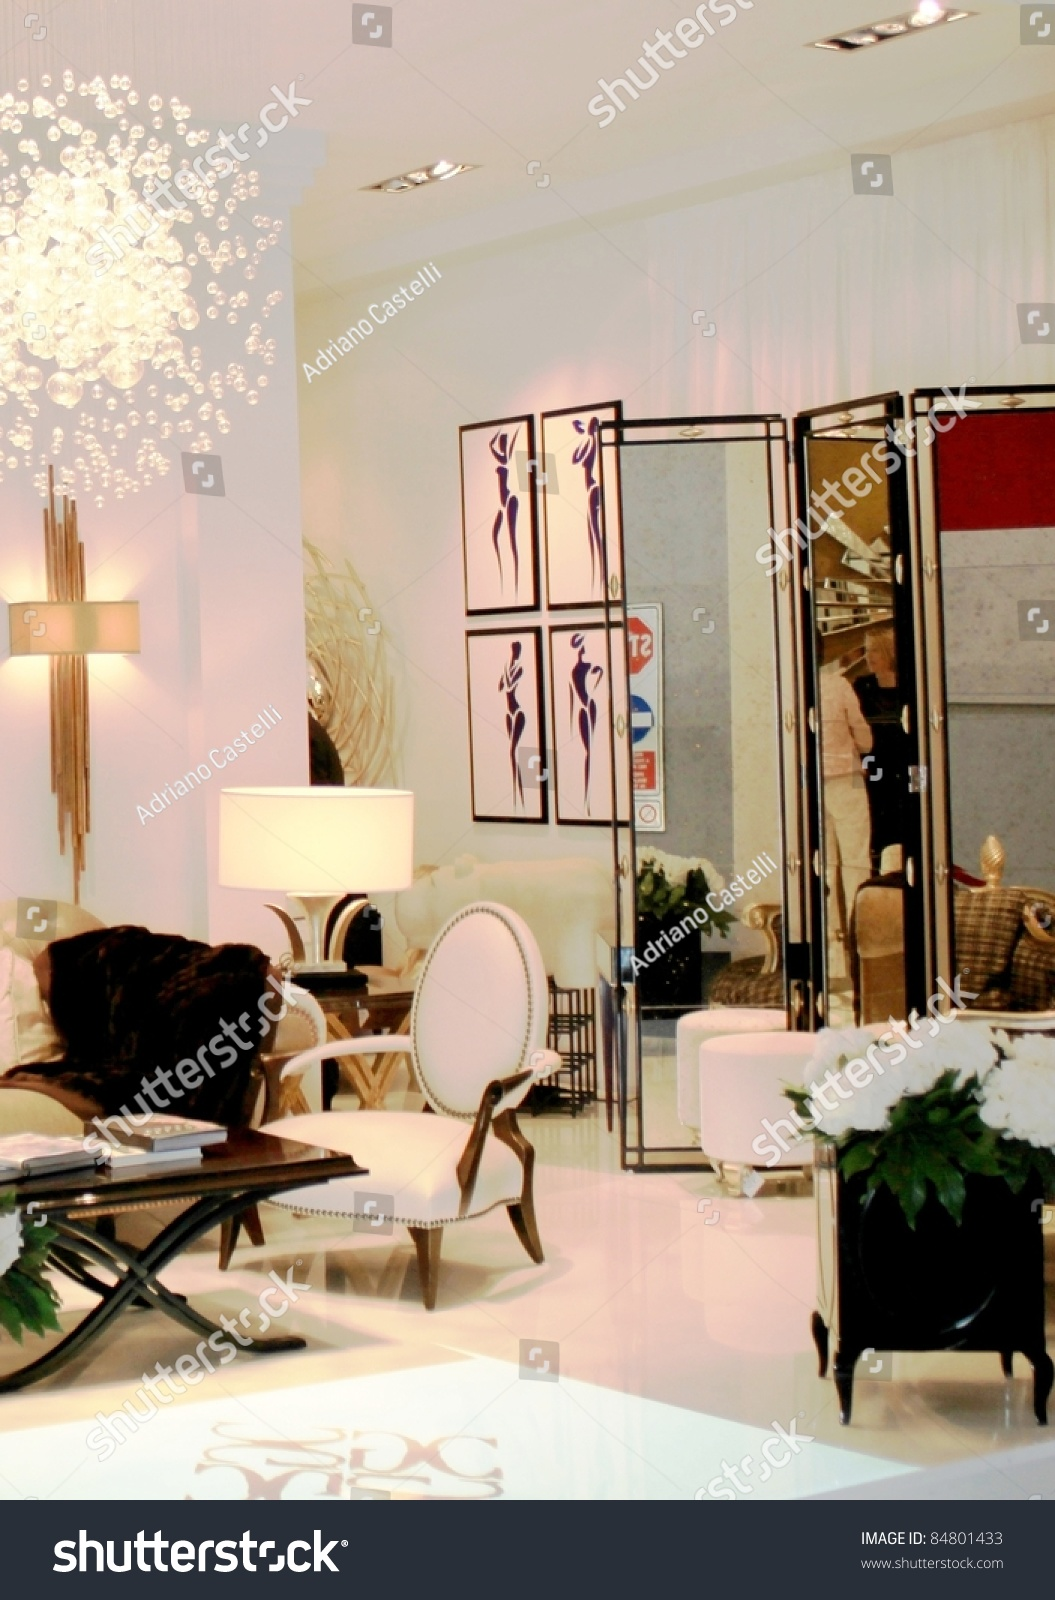 Milan april 15 closeup interior design stock photo 84801433 shutterstock for International interior design exhibition